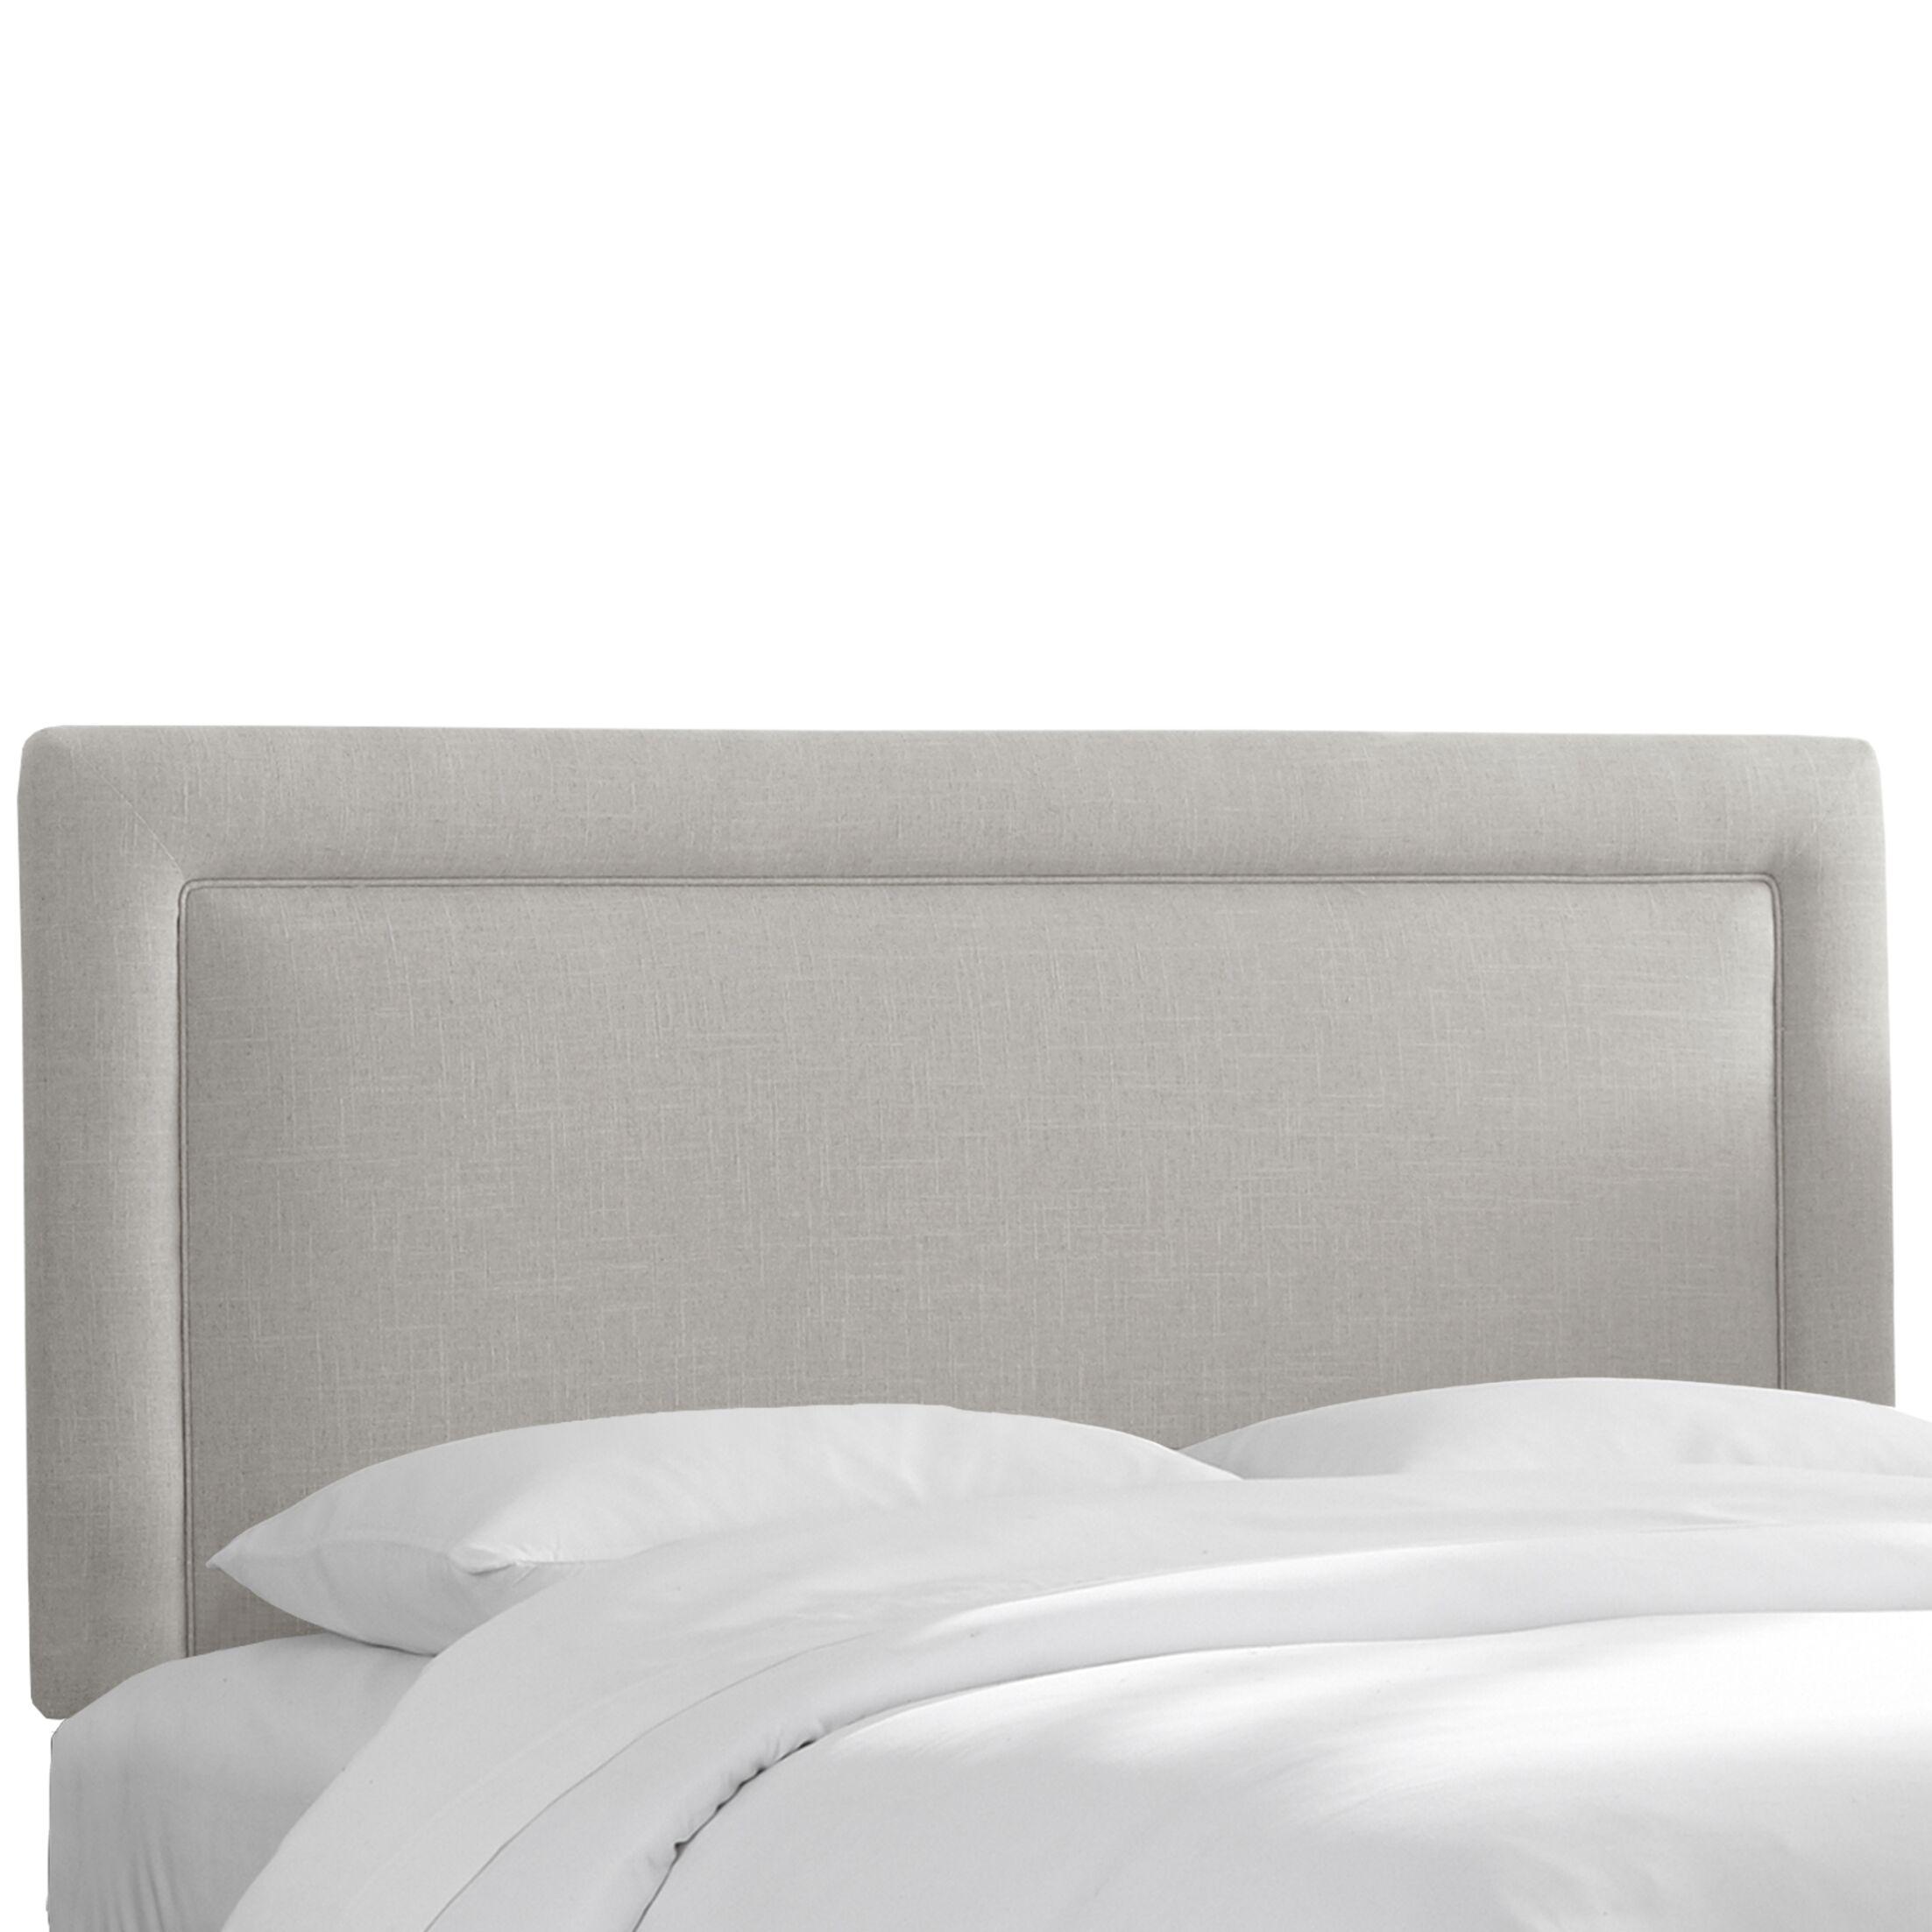 Cygni Upholstered Panel Headboard Size: Queen